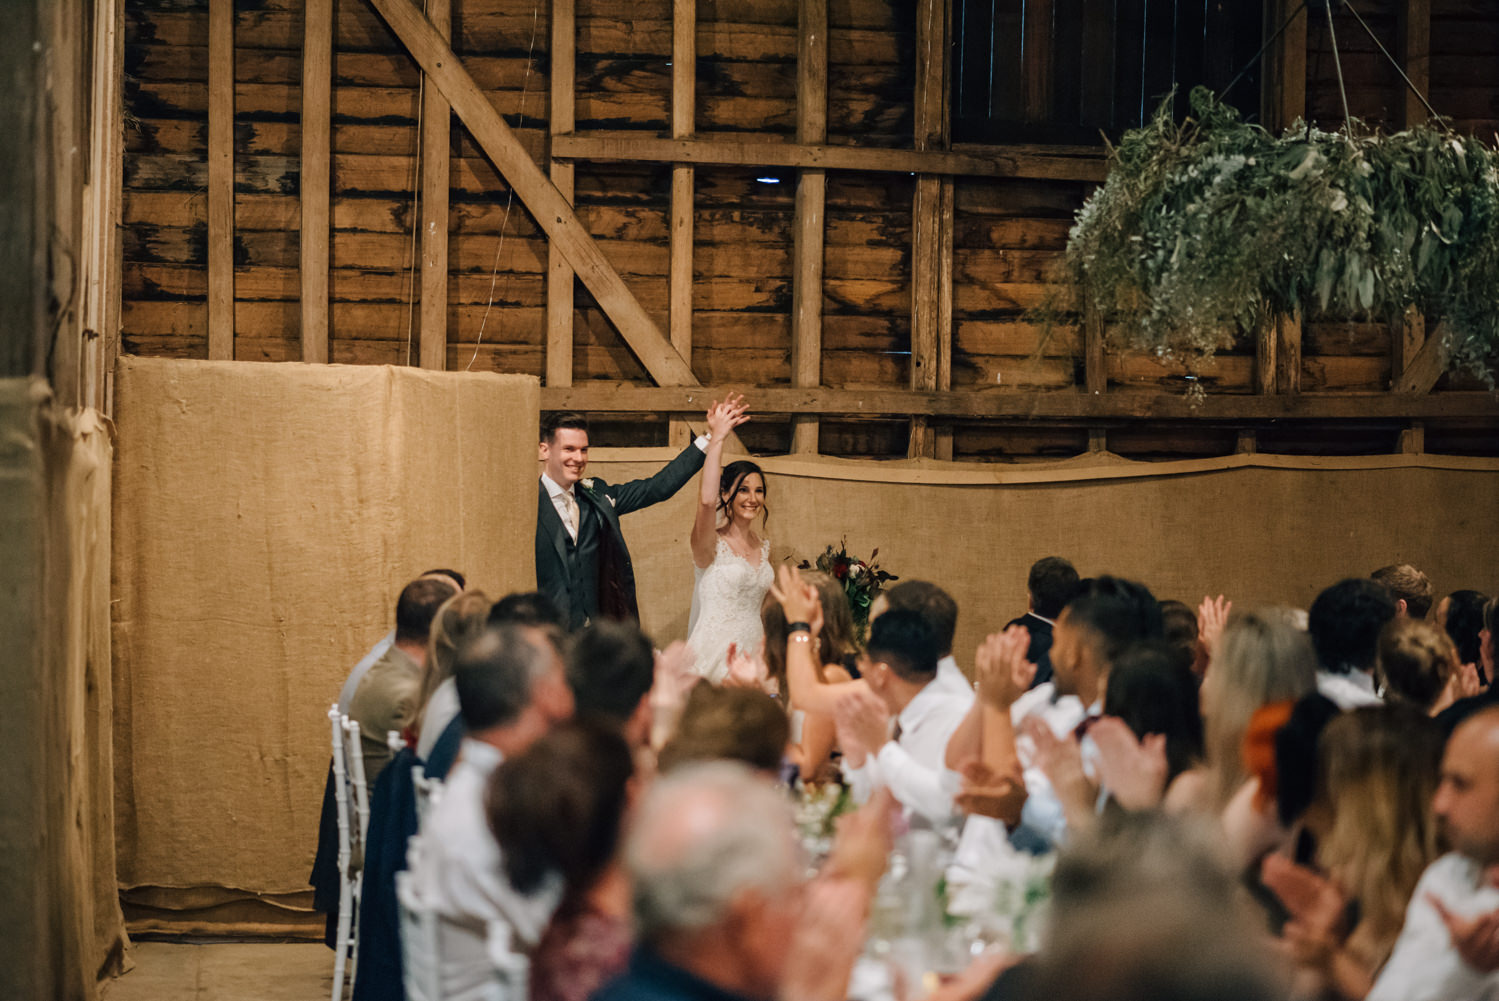 Brickendon-Wedding-Photographer-127.jpg